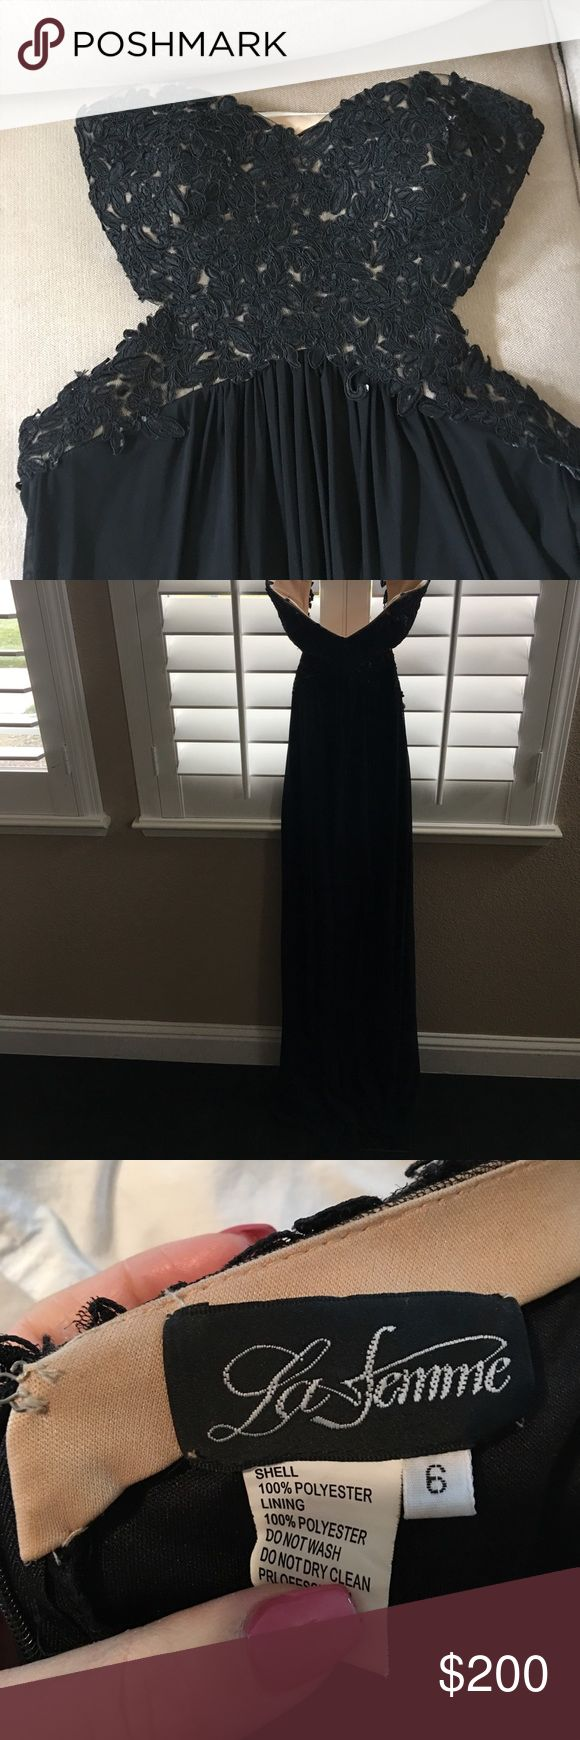 La femme dress worn once La femme dress worn once La Femme Dresses